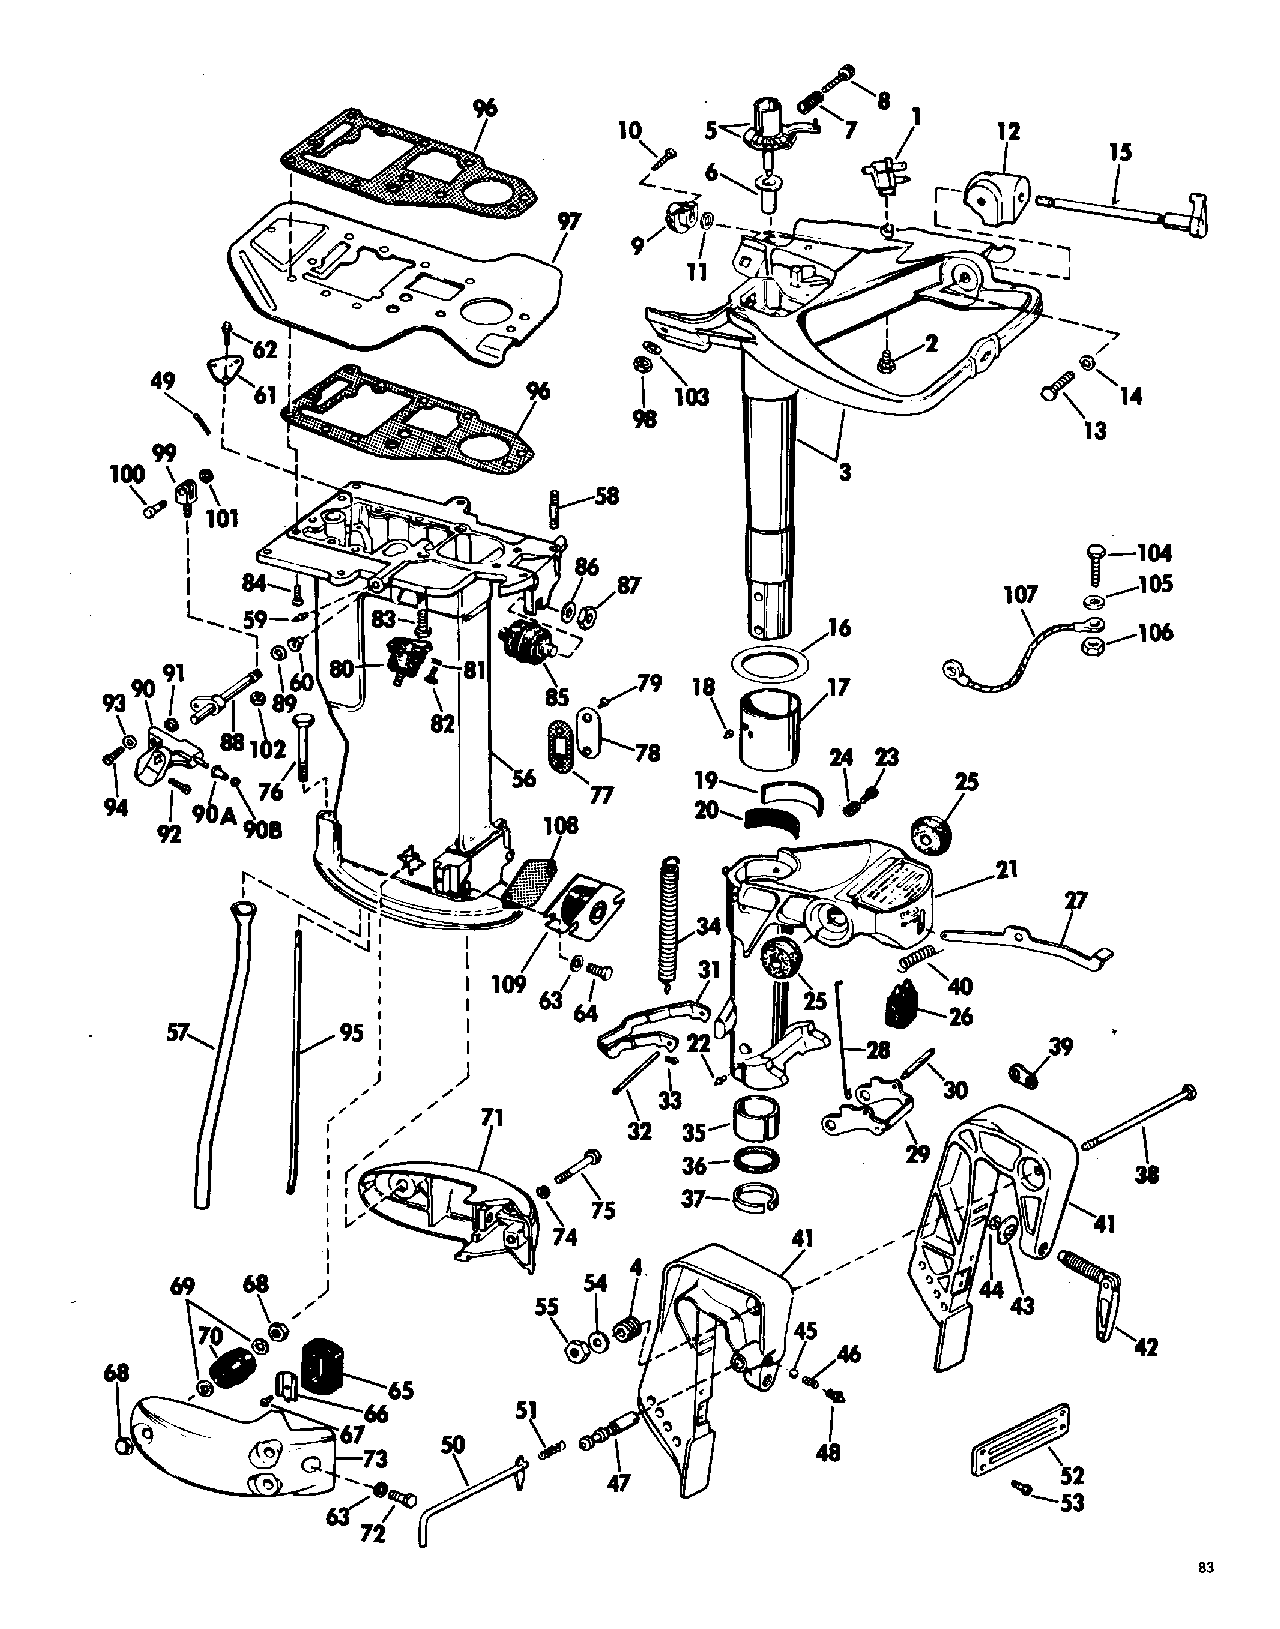 Pictorial diagram of icon engine rigging array brp evinrude en 1968 33 33852r 1968 lower unit group rh vansoutboardparts